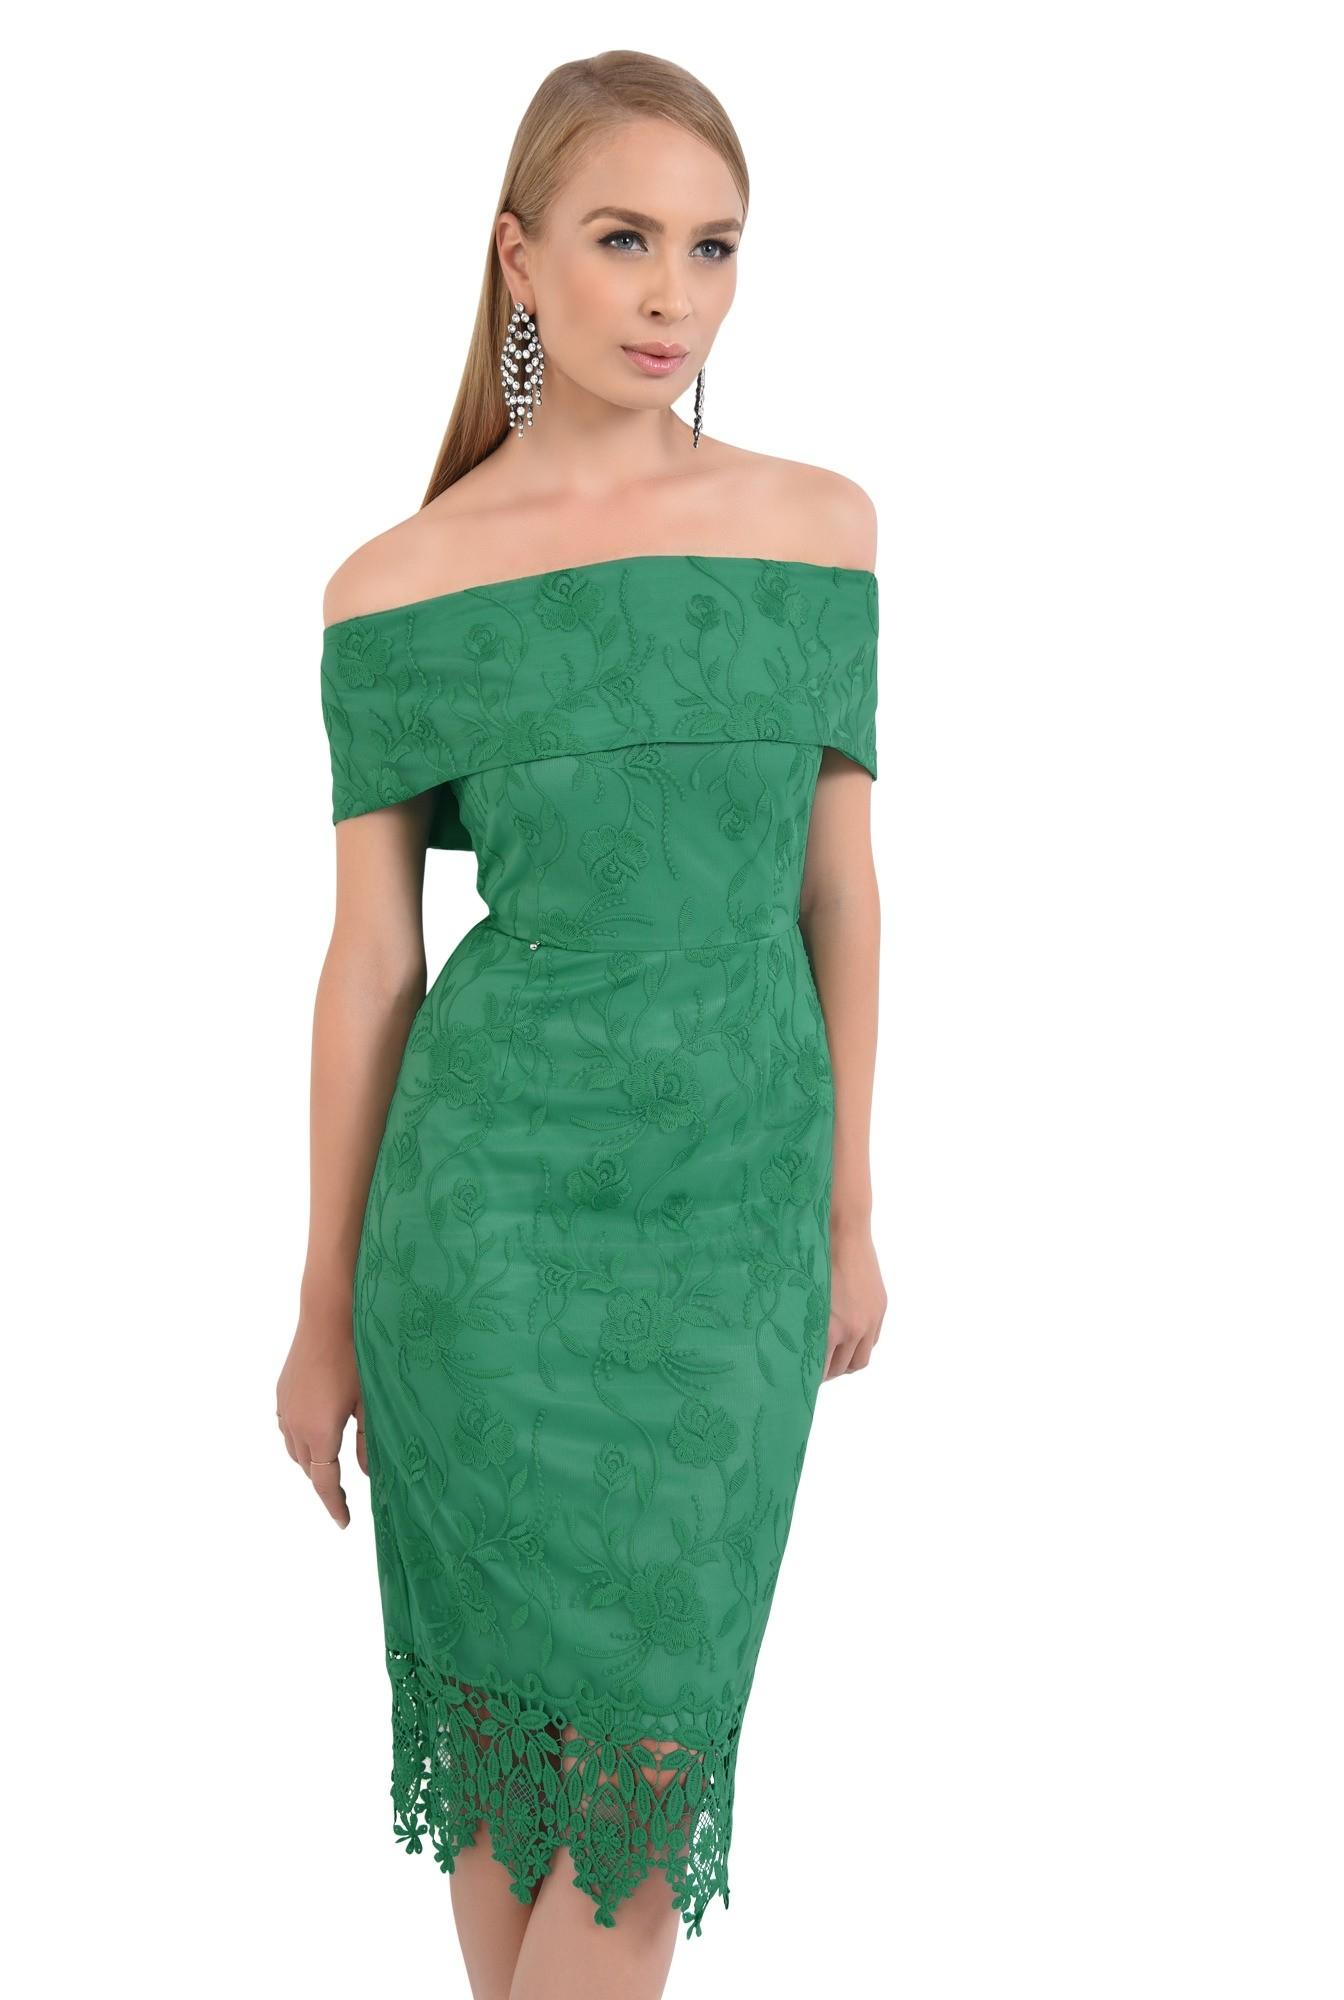 0 - rochie eleganta, conica, dantela, verde, umeri goi, rochii online